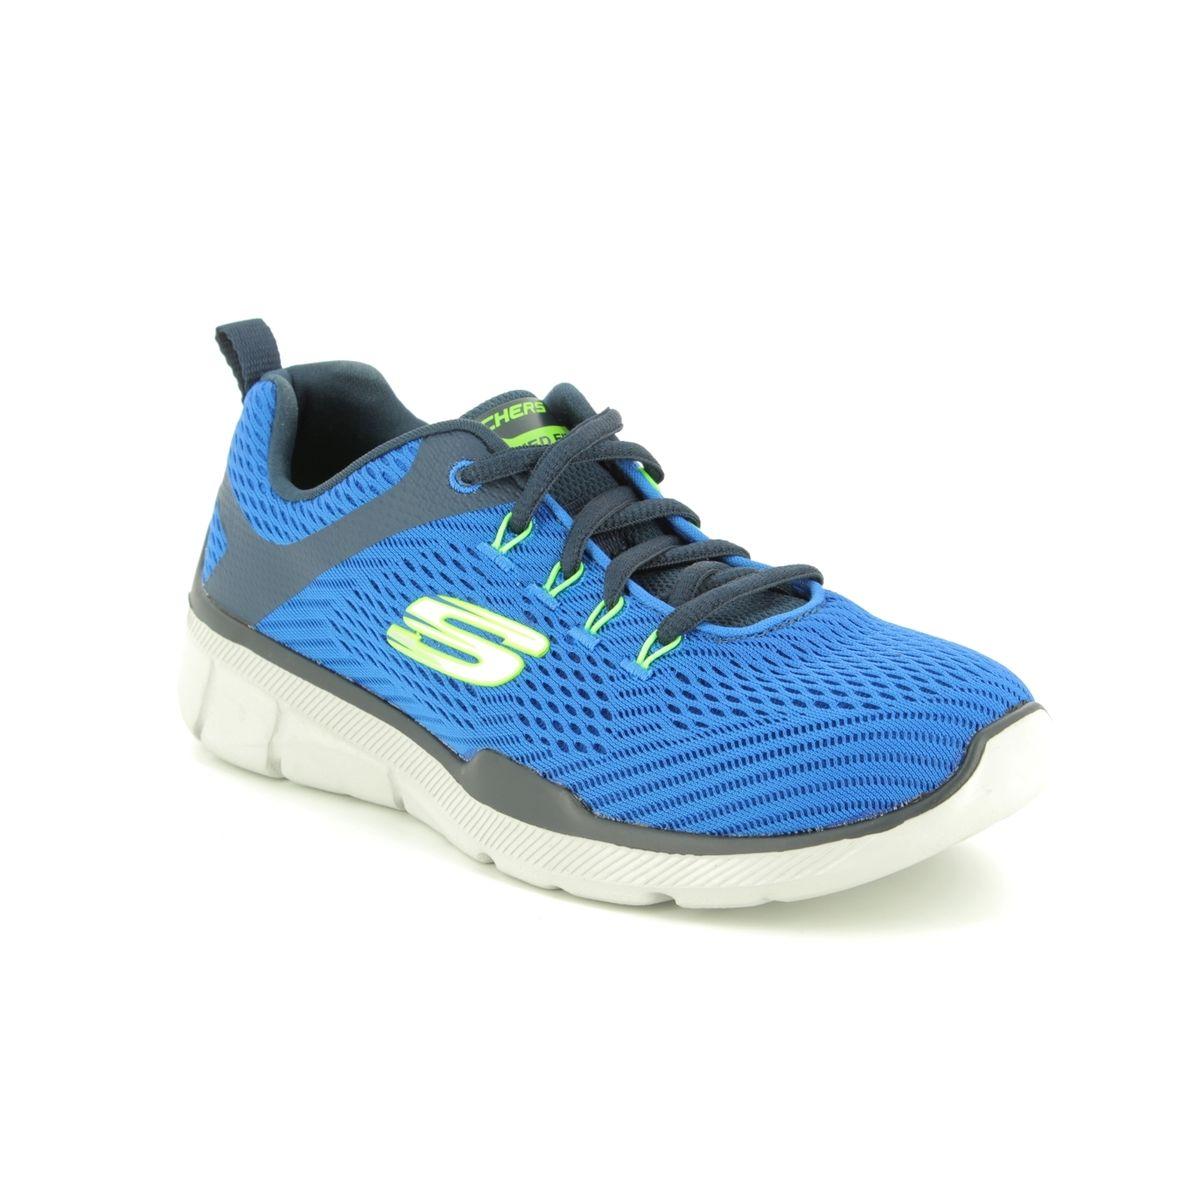 Details zu Skechers Equalizer 3.0 Herren Air Cooled Sneaker Trainer Memory Foam blau